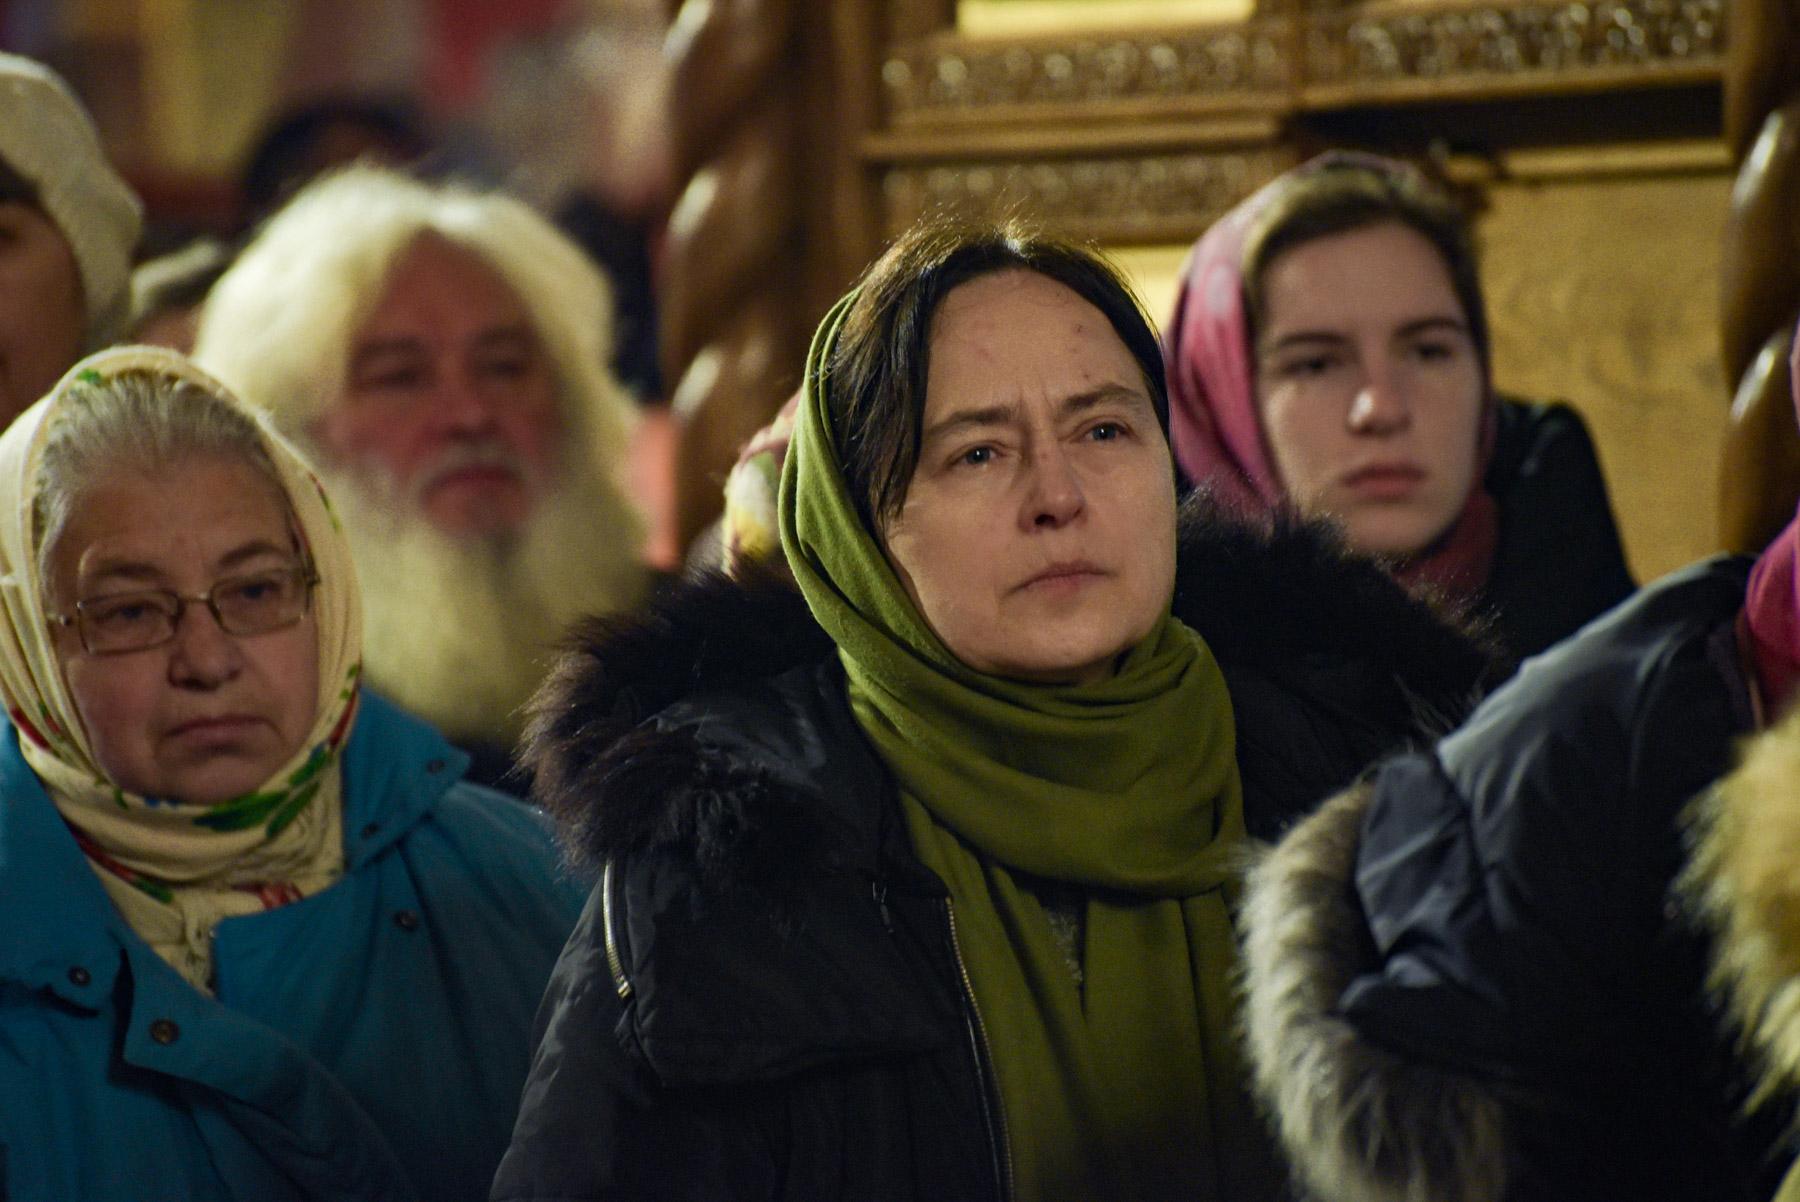 photos of orthodox christmas 0097 2